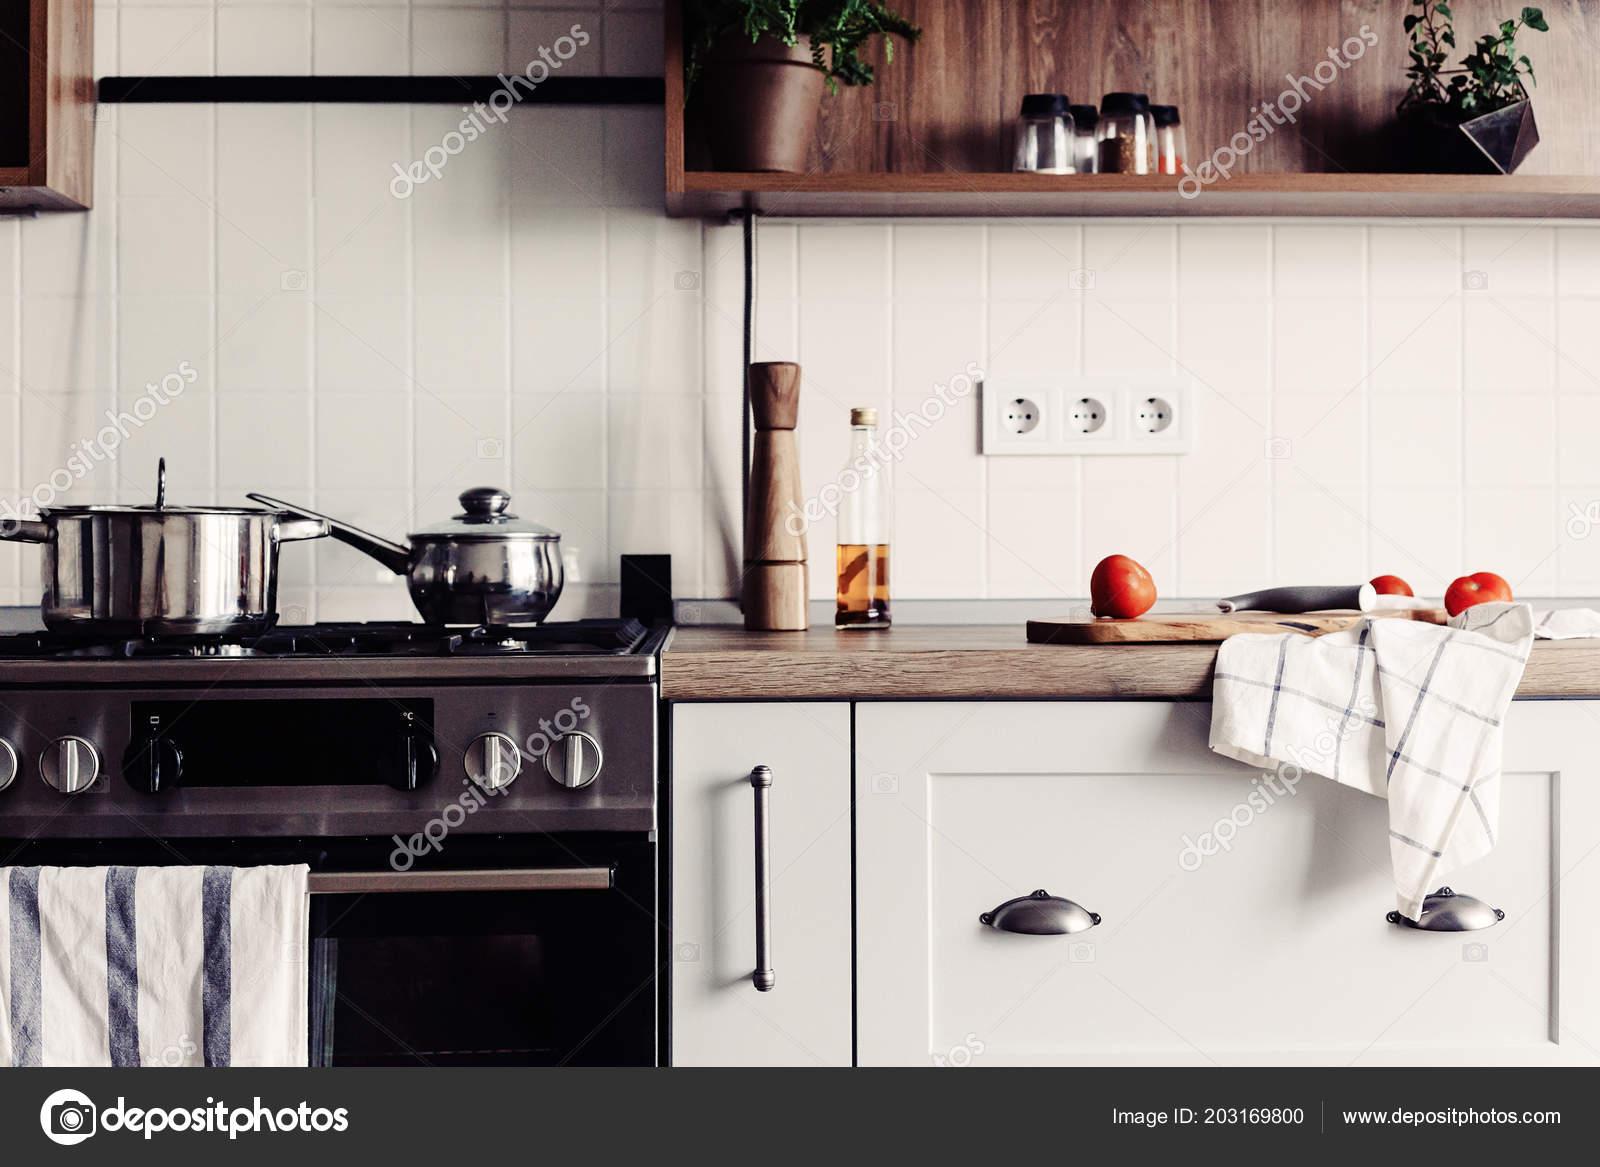 Koken moderne keuken scandinavische stijl stijlvolle keuken